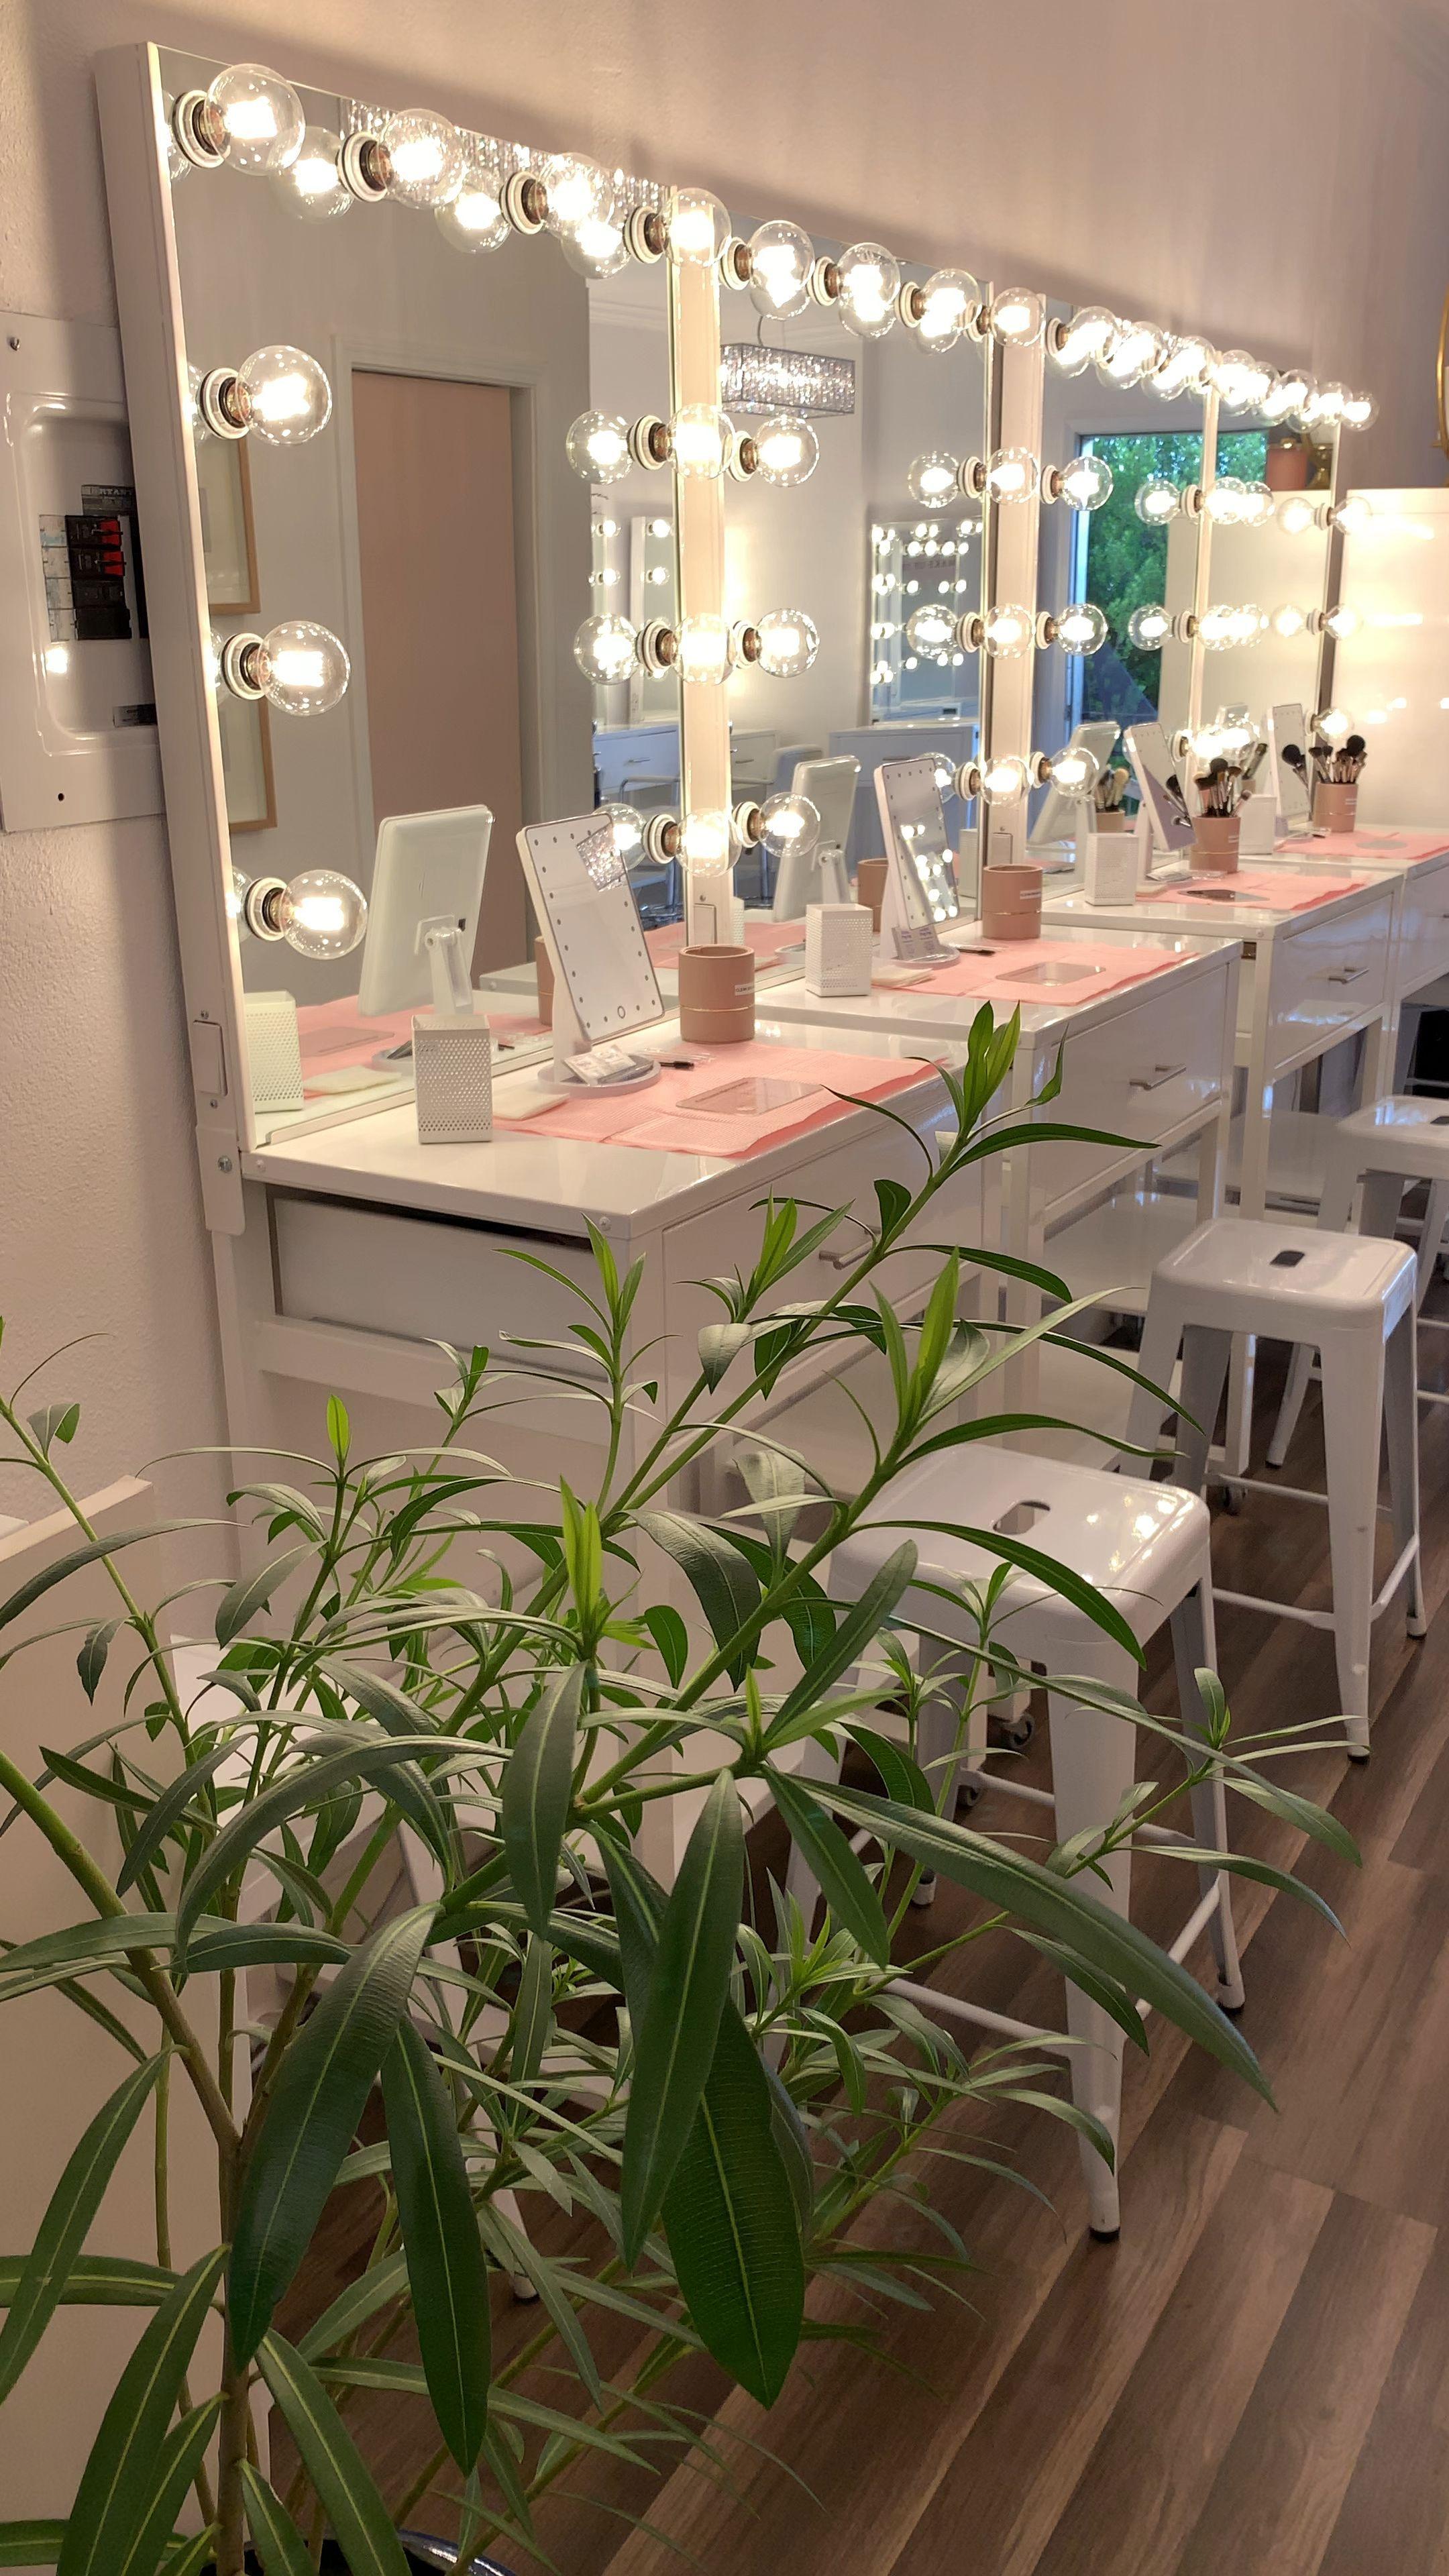 Makeup Classes Follow Us On Ig Www Instagram Com Makeup Makeup Room Ideas Videos Studio In 2020 Makeup Studio Decor Beauty Room Salon Salon Interior Design